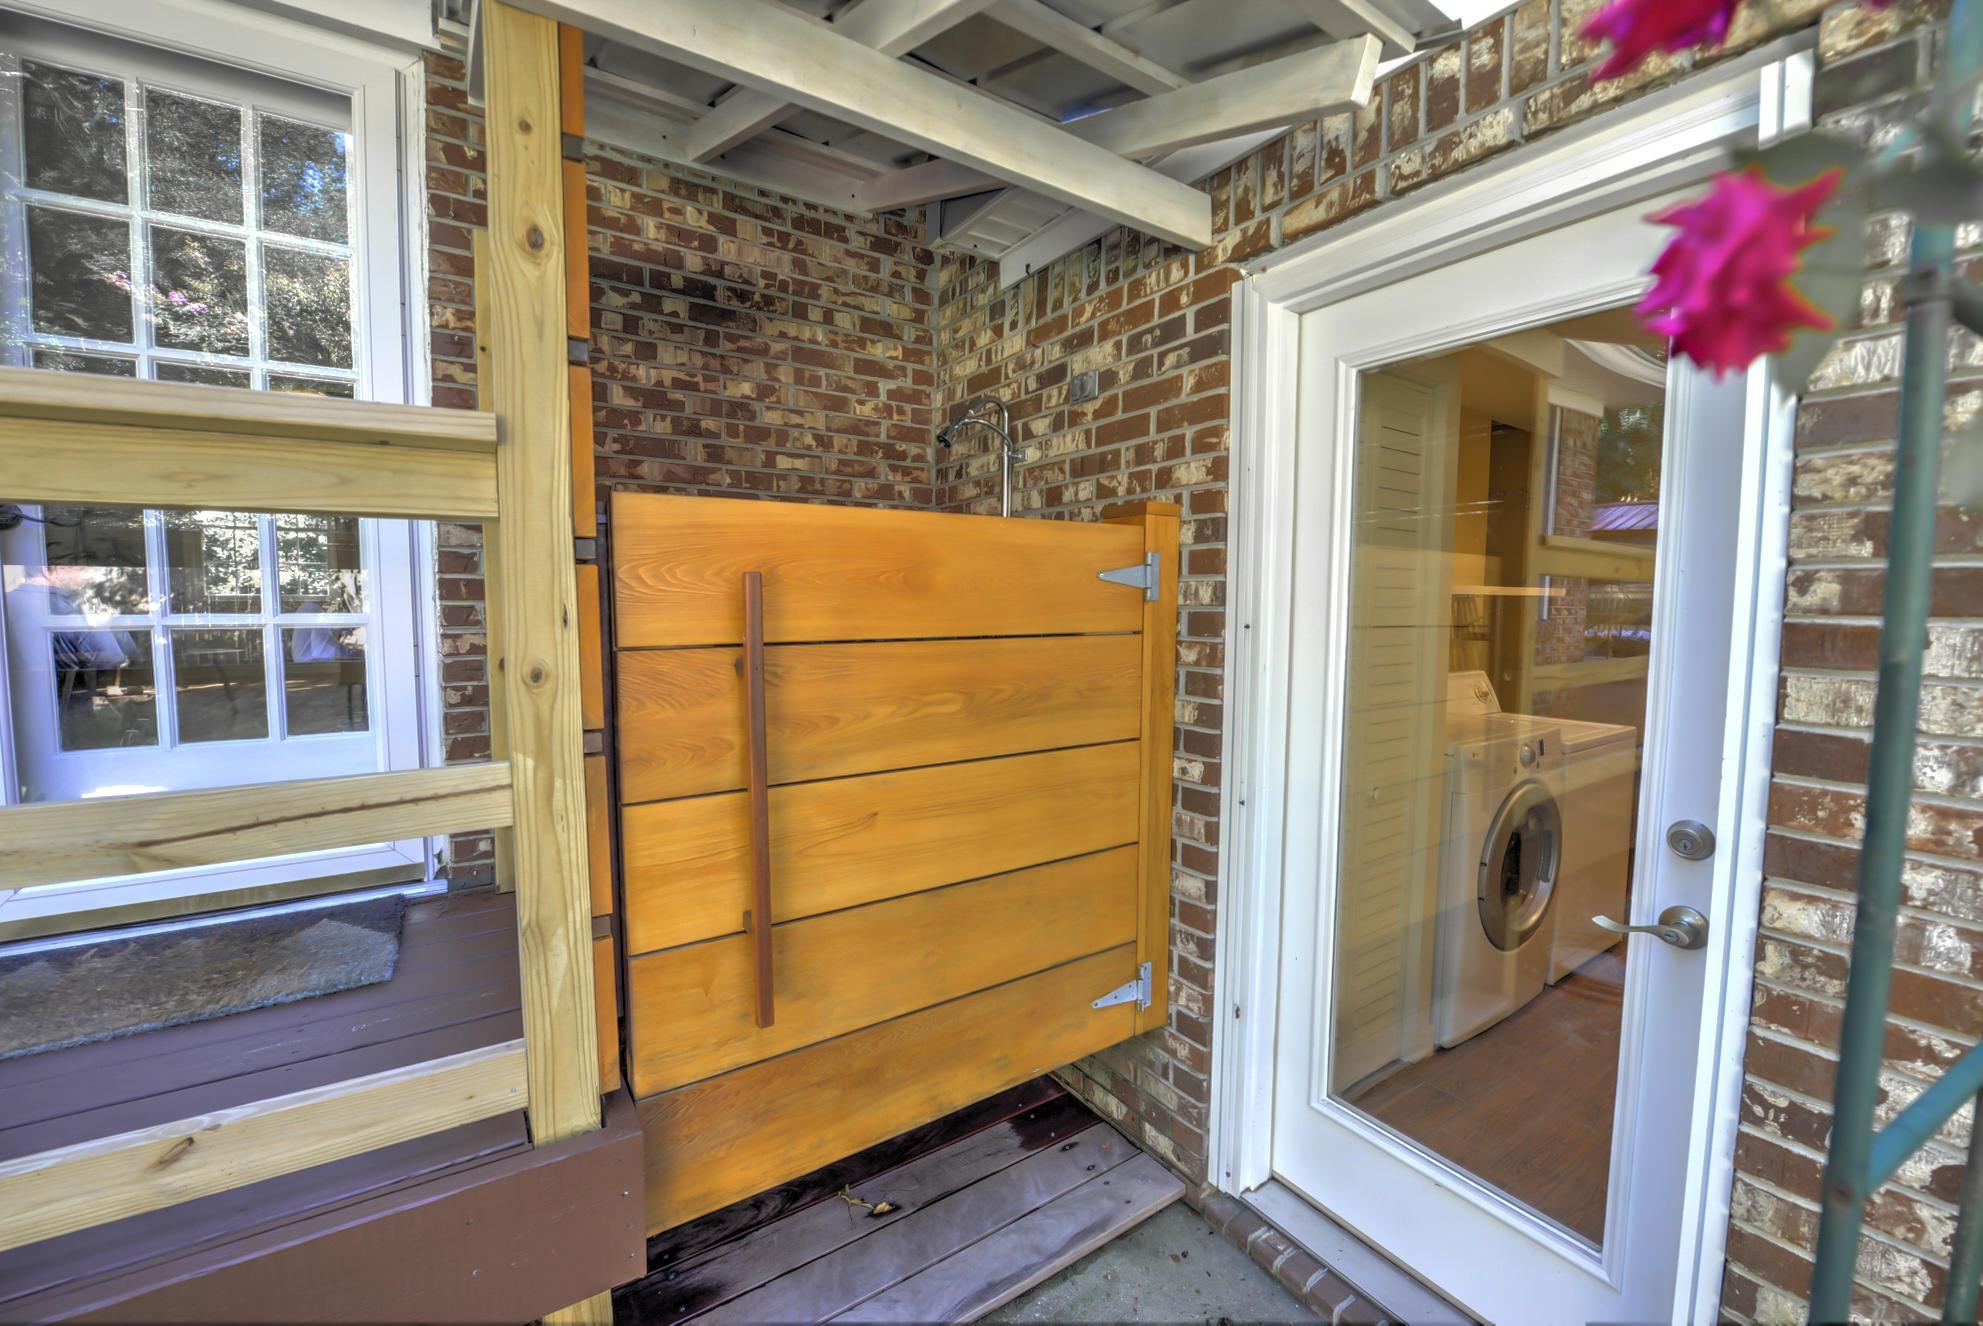 Shemwood II Homes For Sale - 1017 Jack Snipe, Mount Pleasant, SC - 13